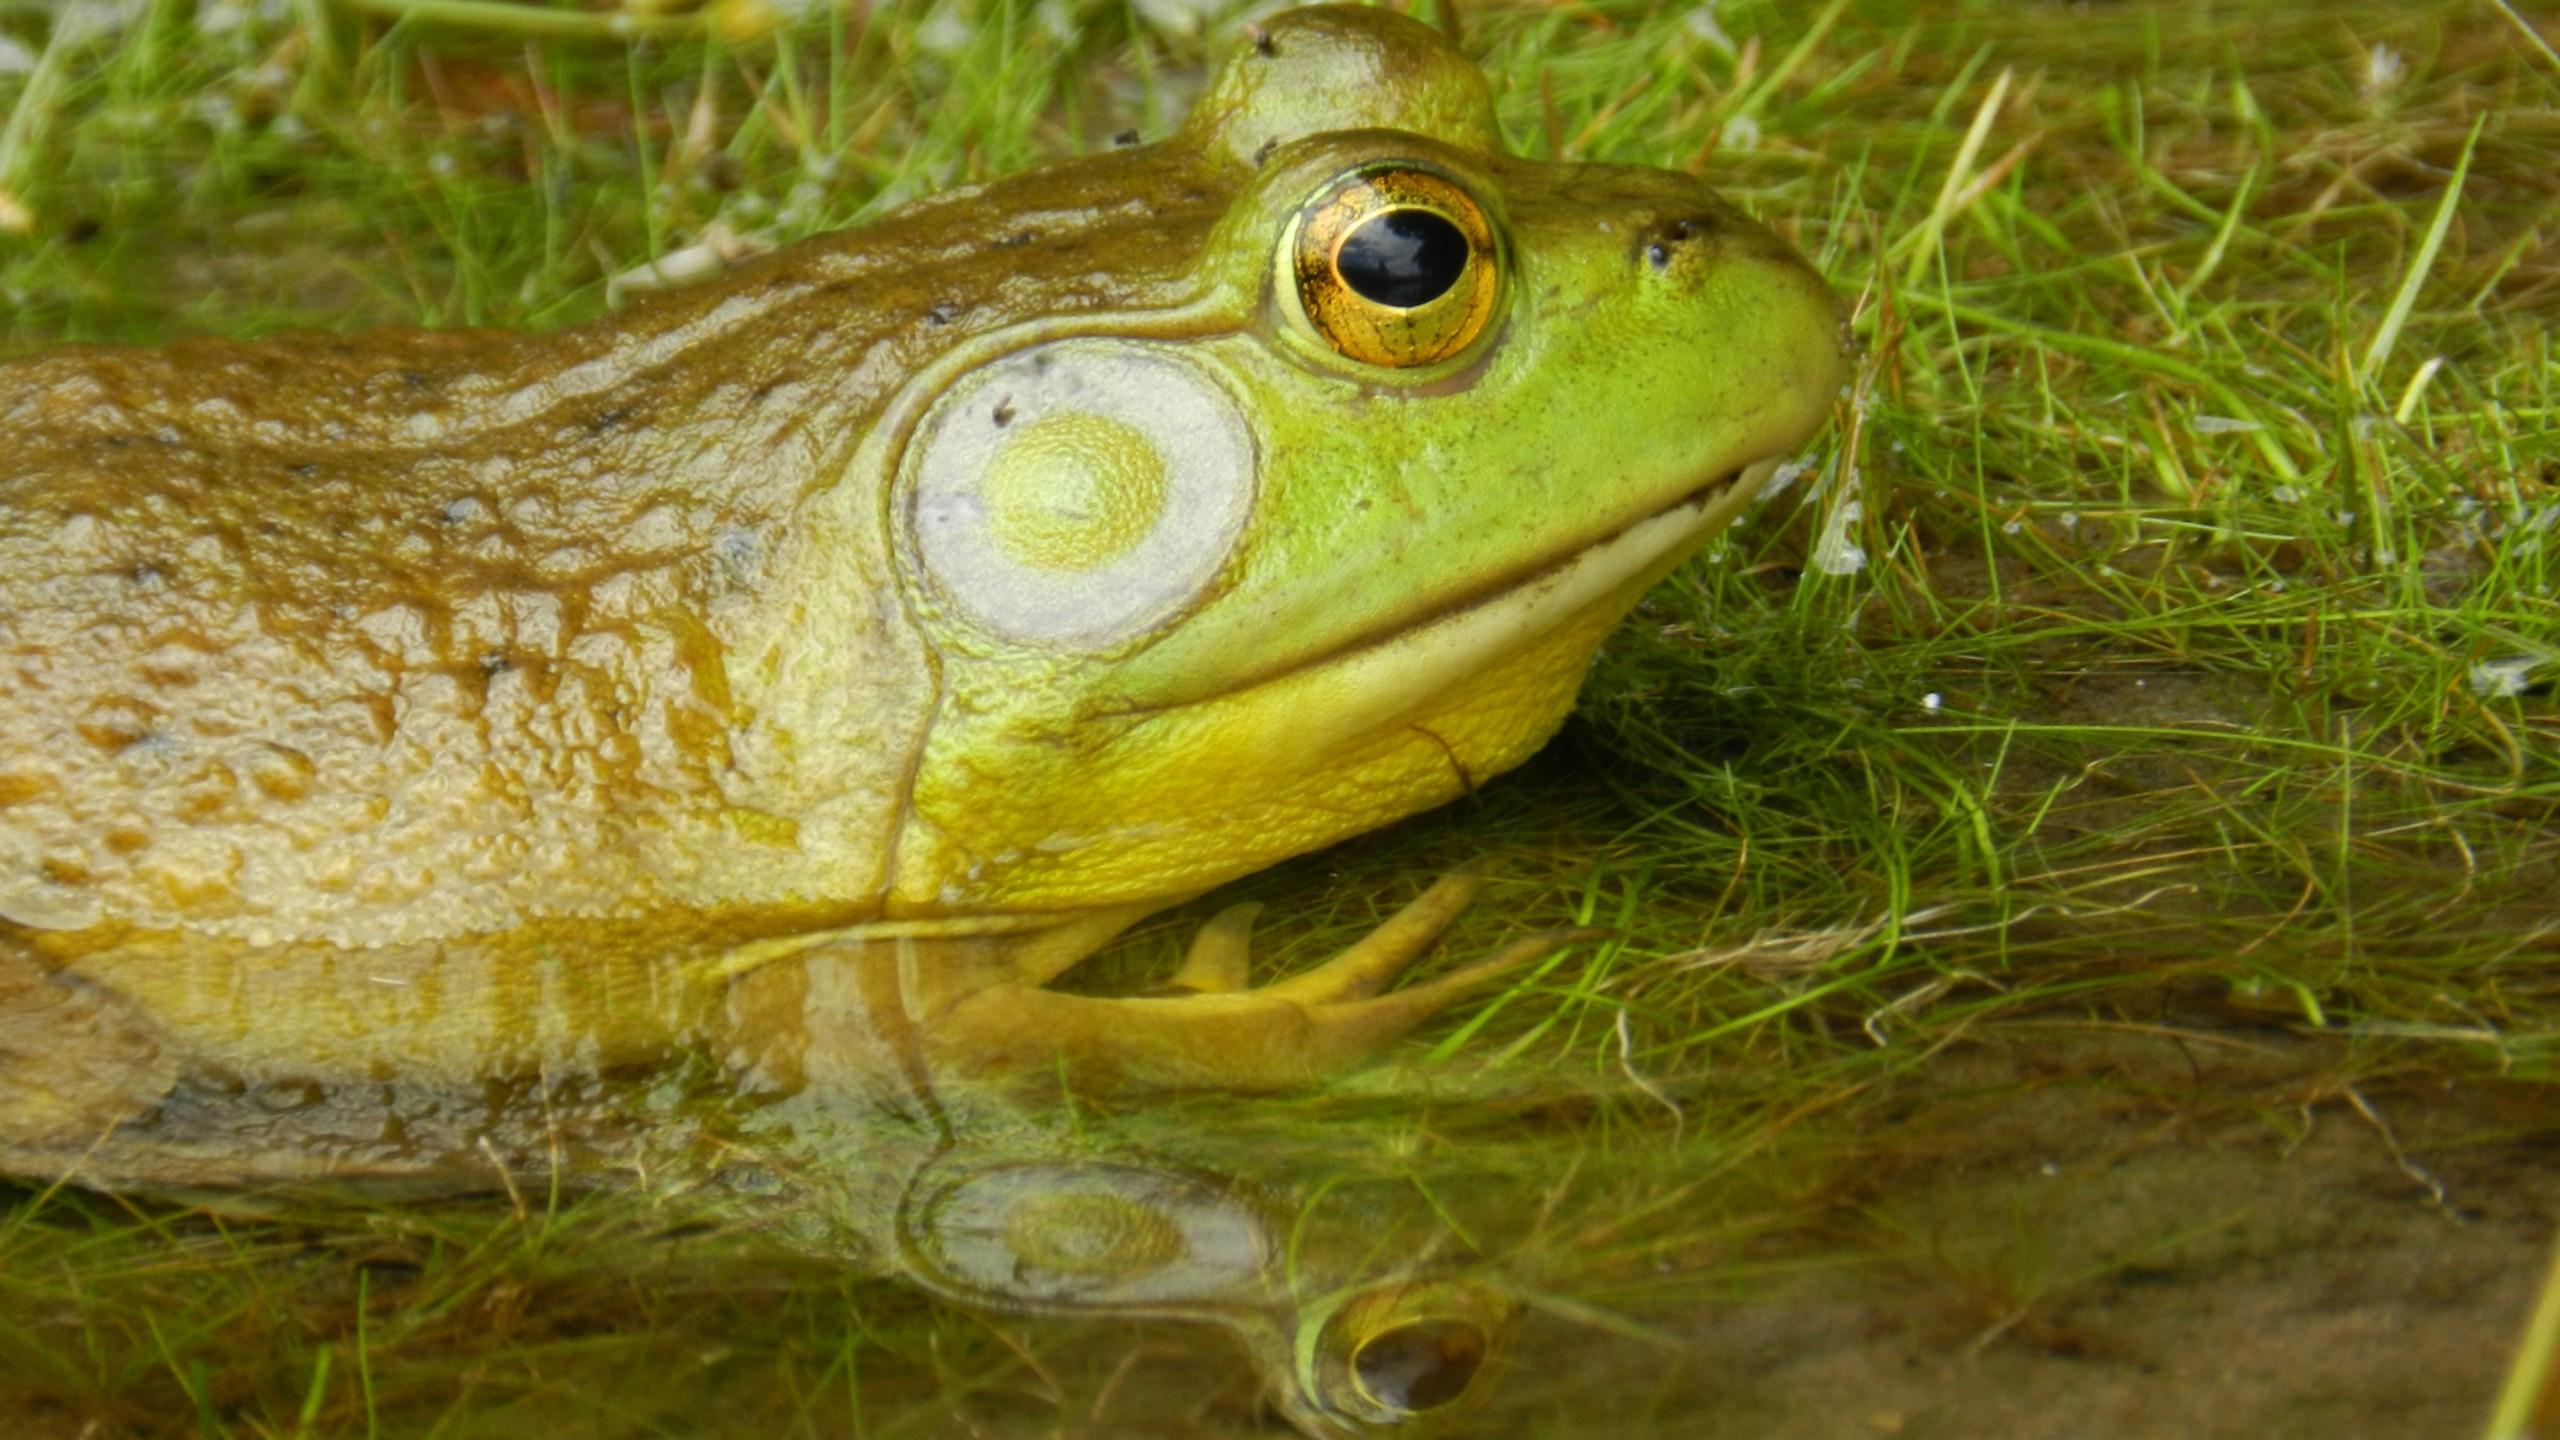 Frog_1491242490543.JPG